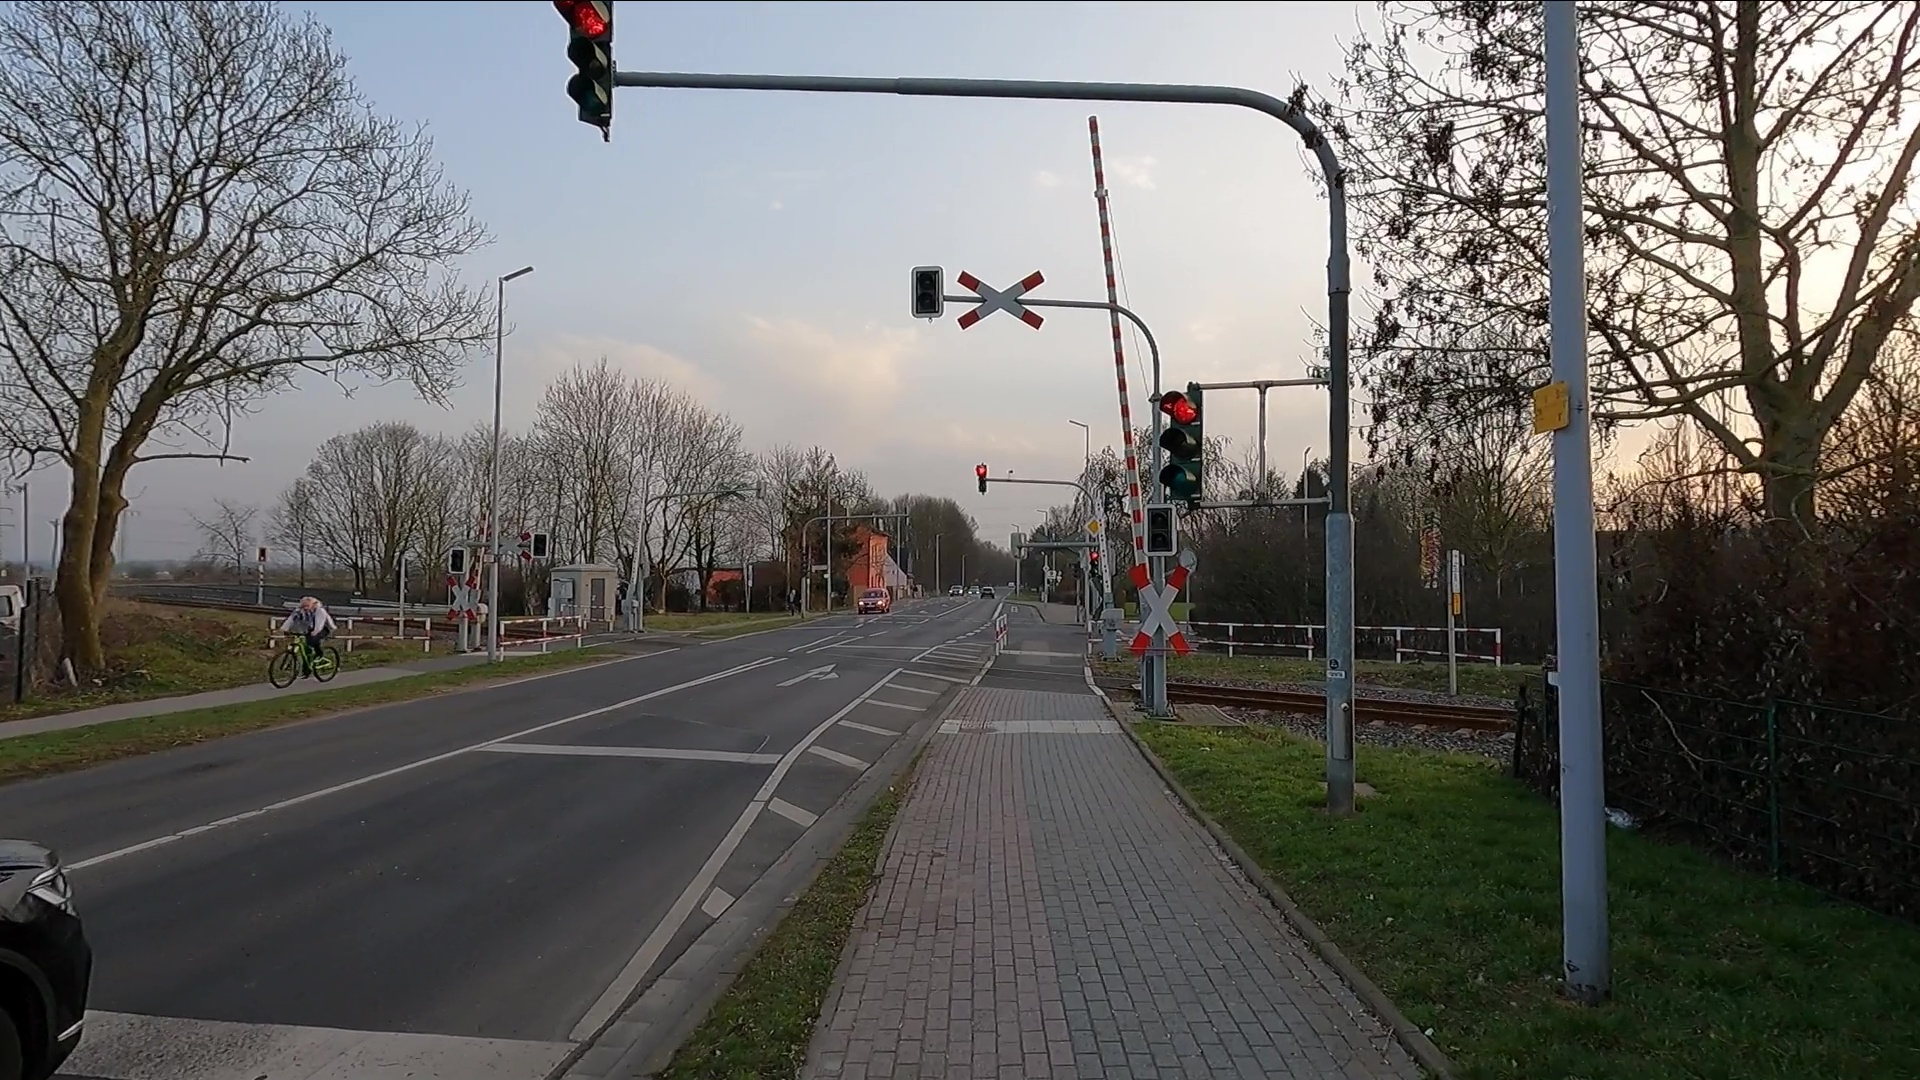 Bild: Rote Ampel neben Radweg